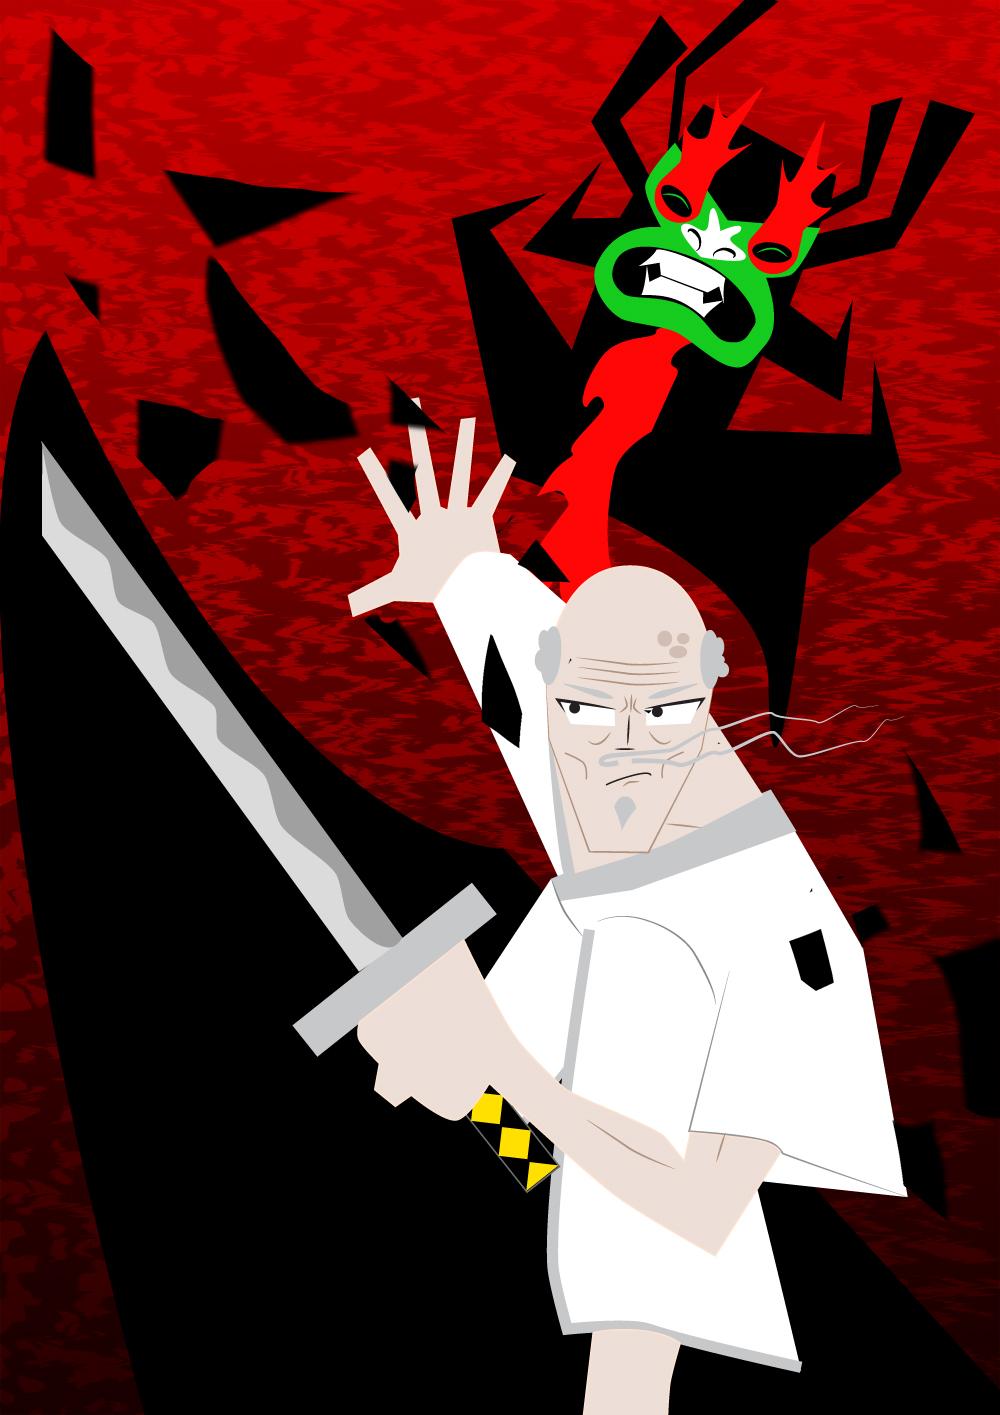 Samurai Jack: Battle Through Time Análise - Gamereactor